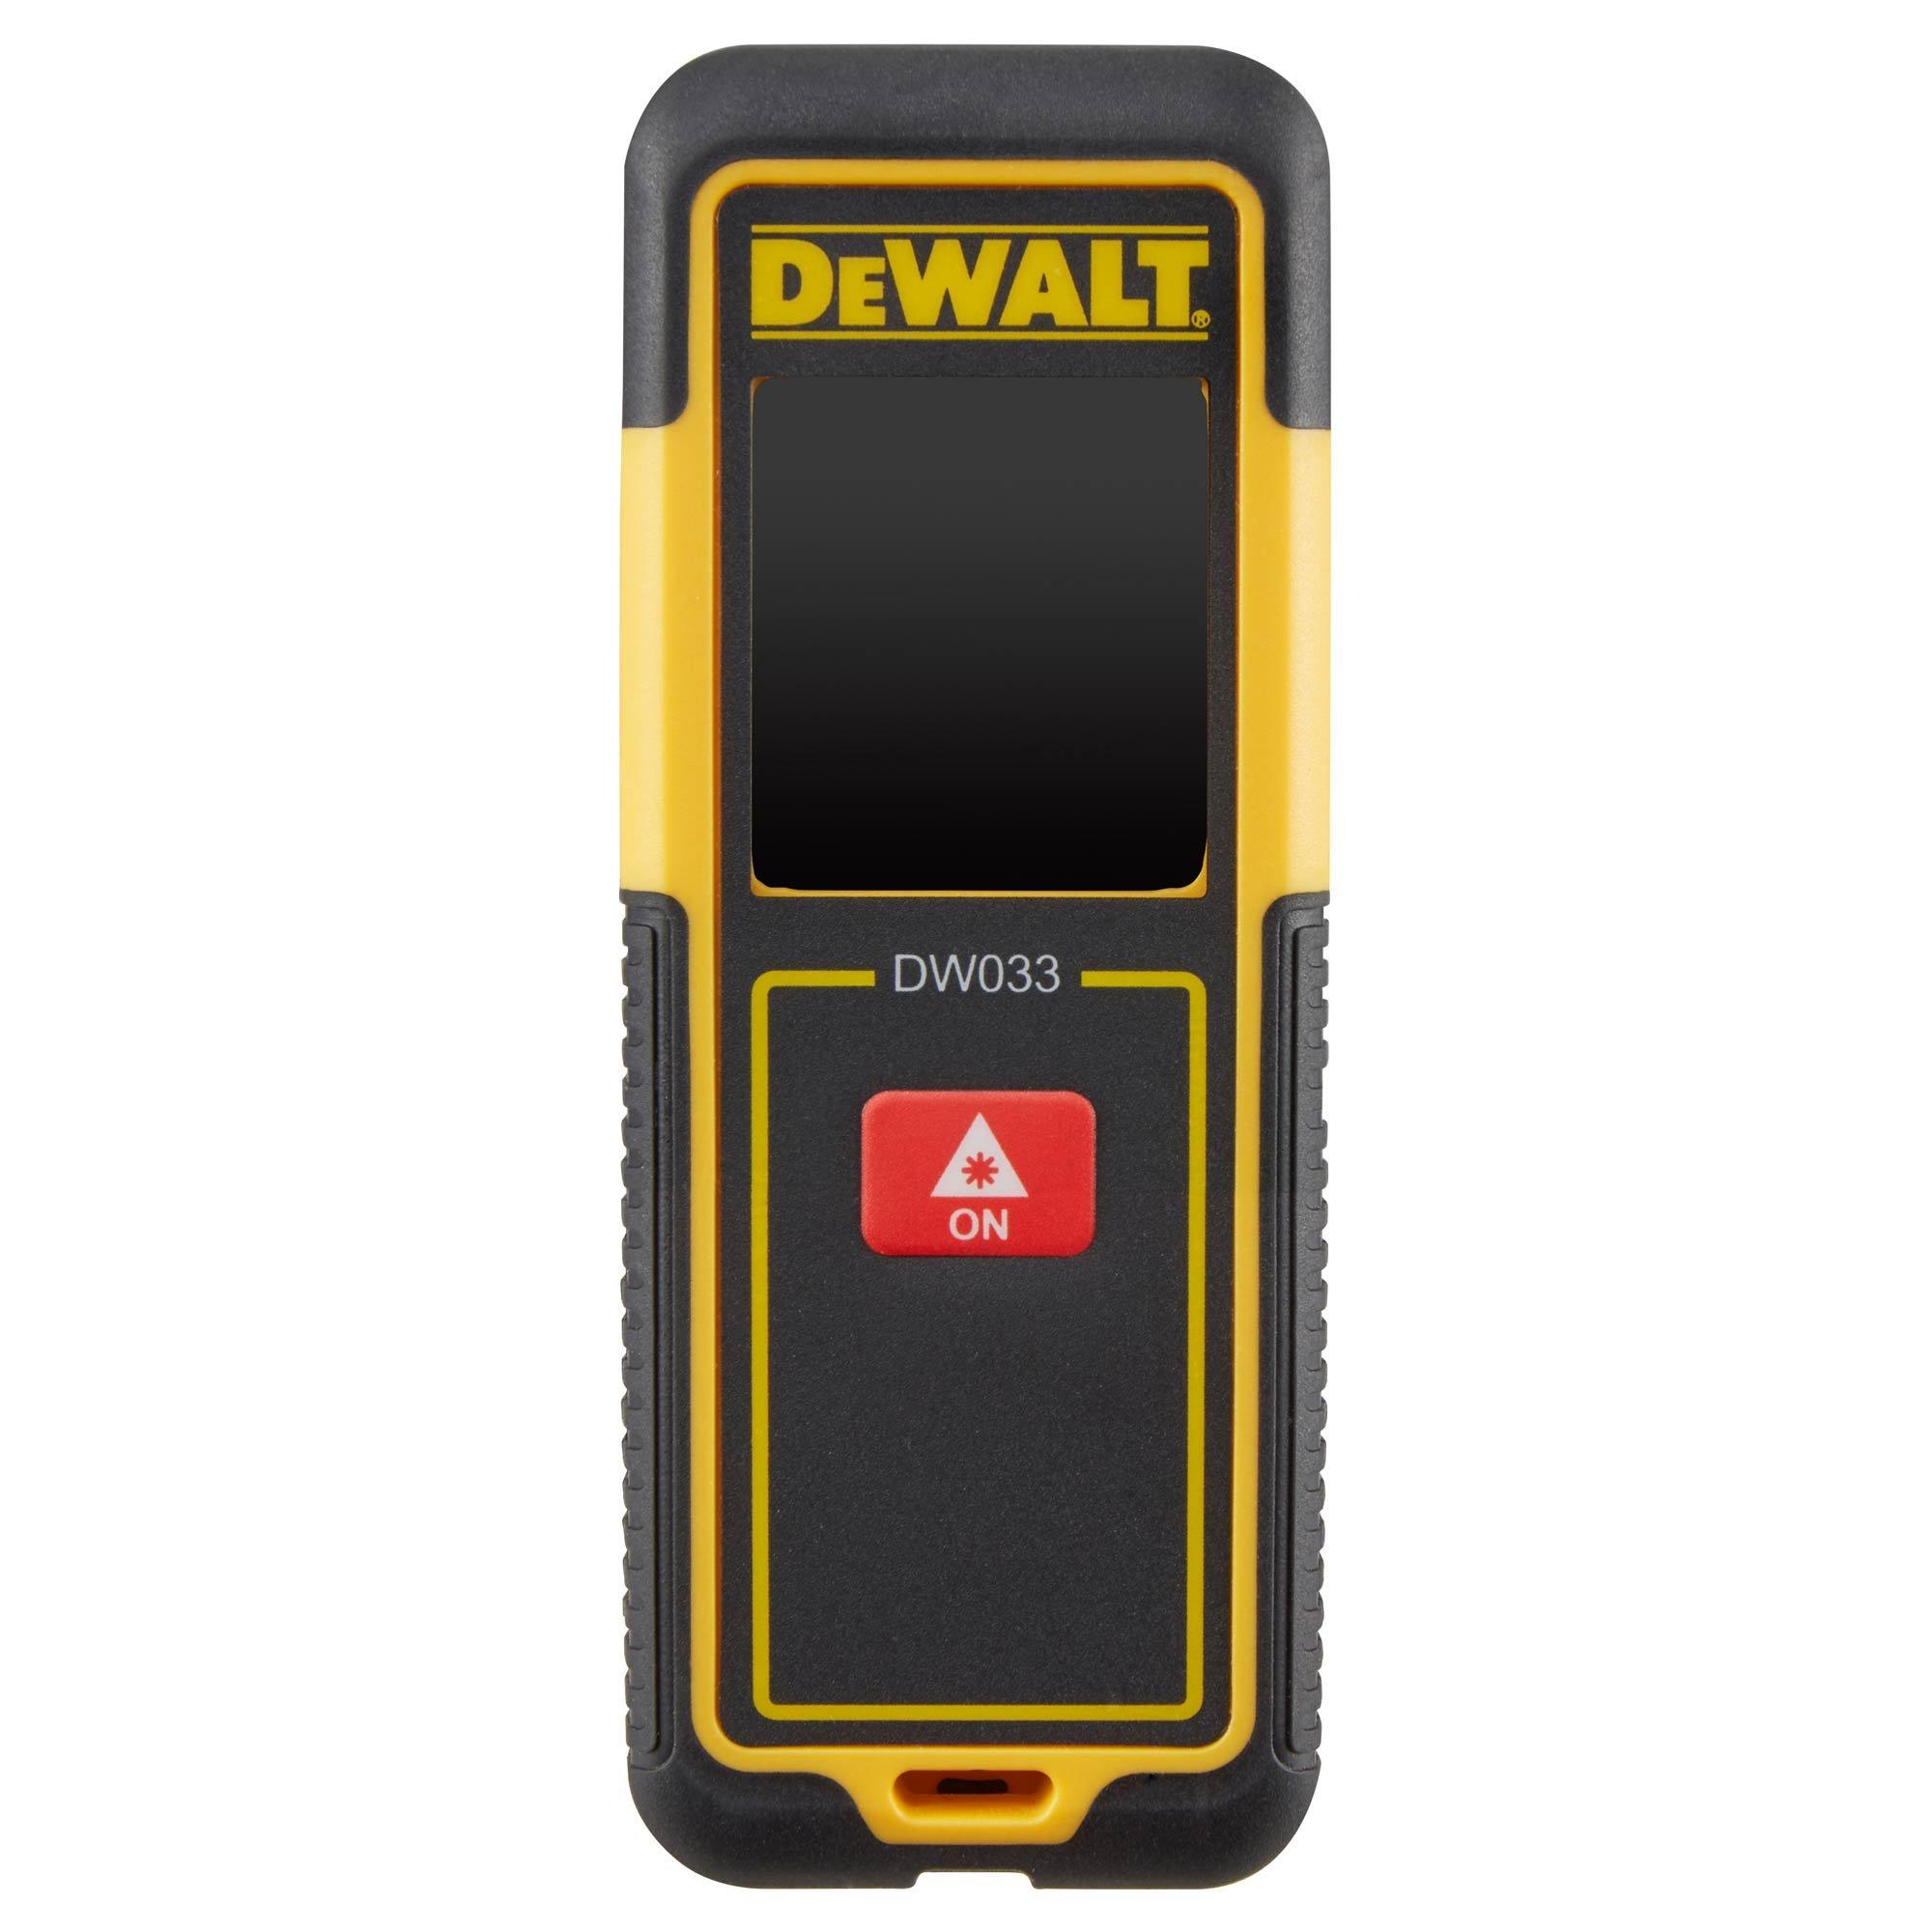 DeWALT DW033 laserový dálkoměr 30m